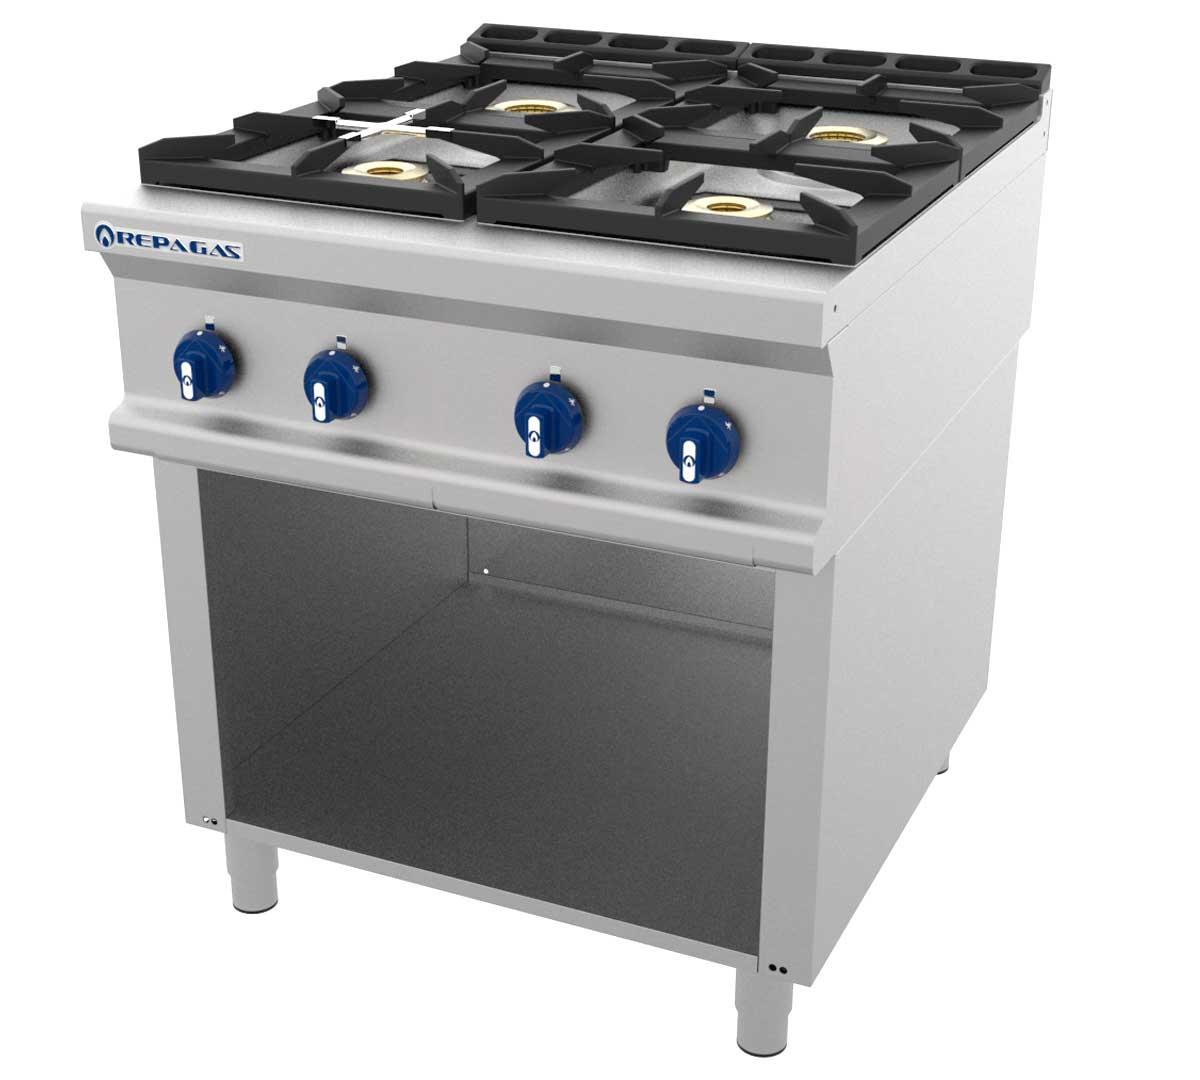 Cocina serie 900 gas de pie de repagas for Cocinas repagas